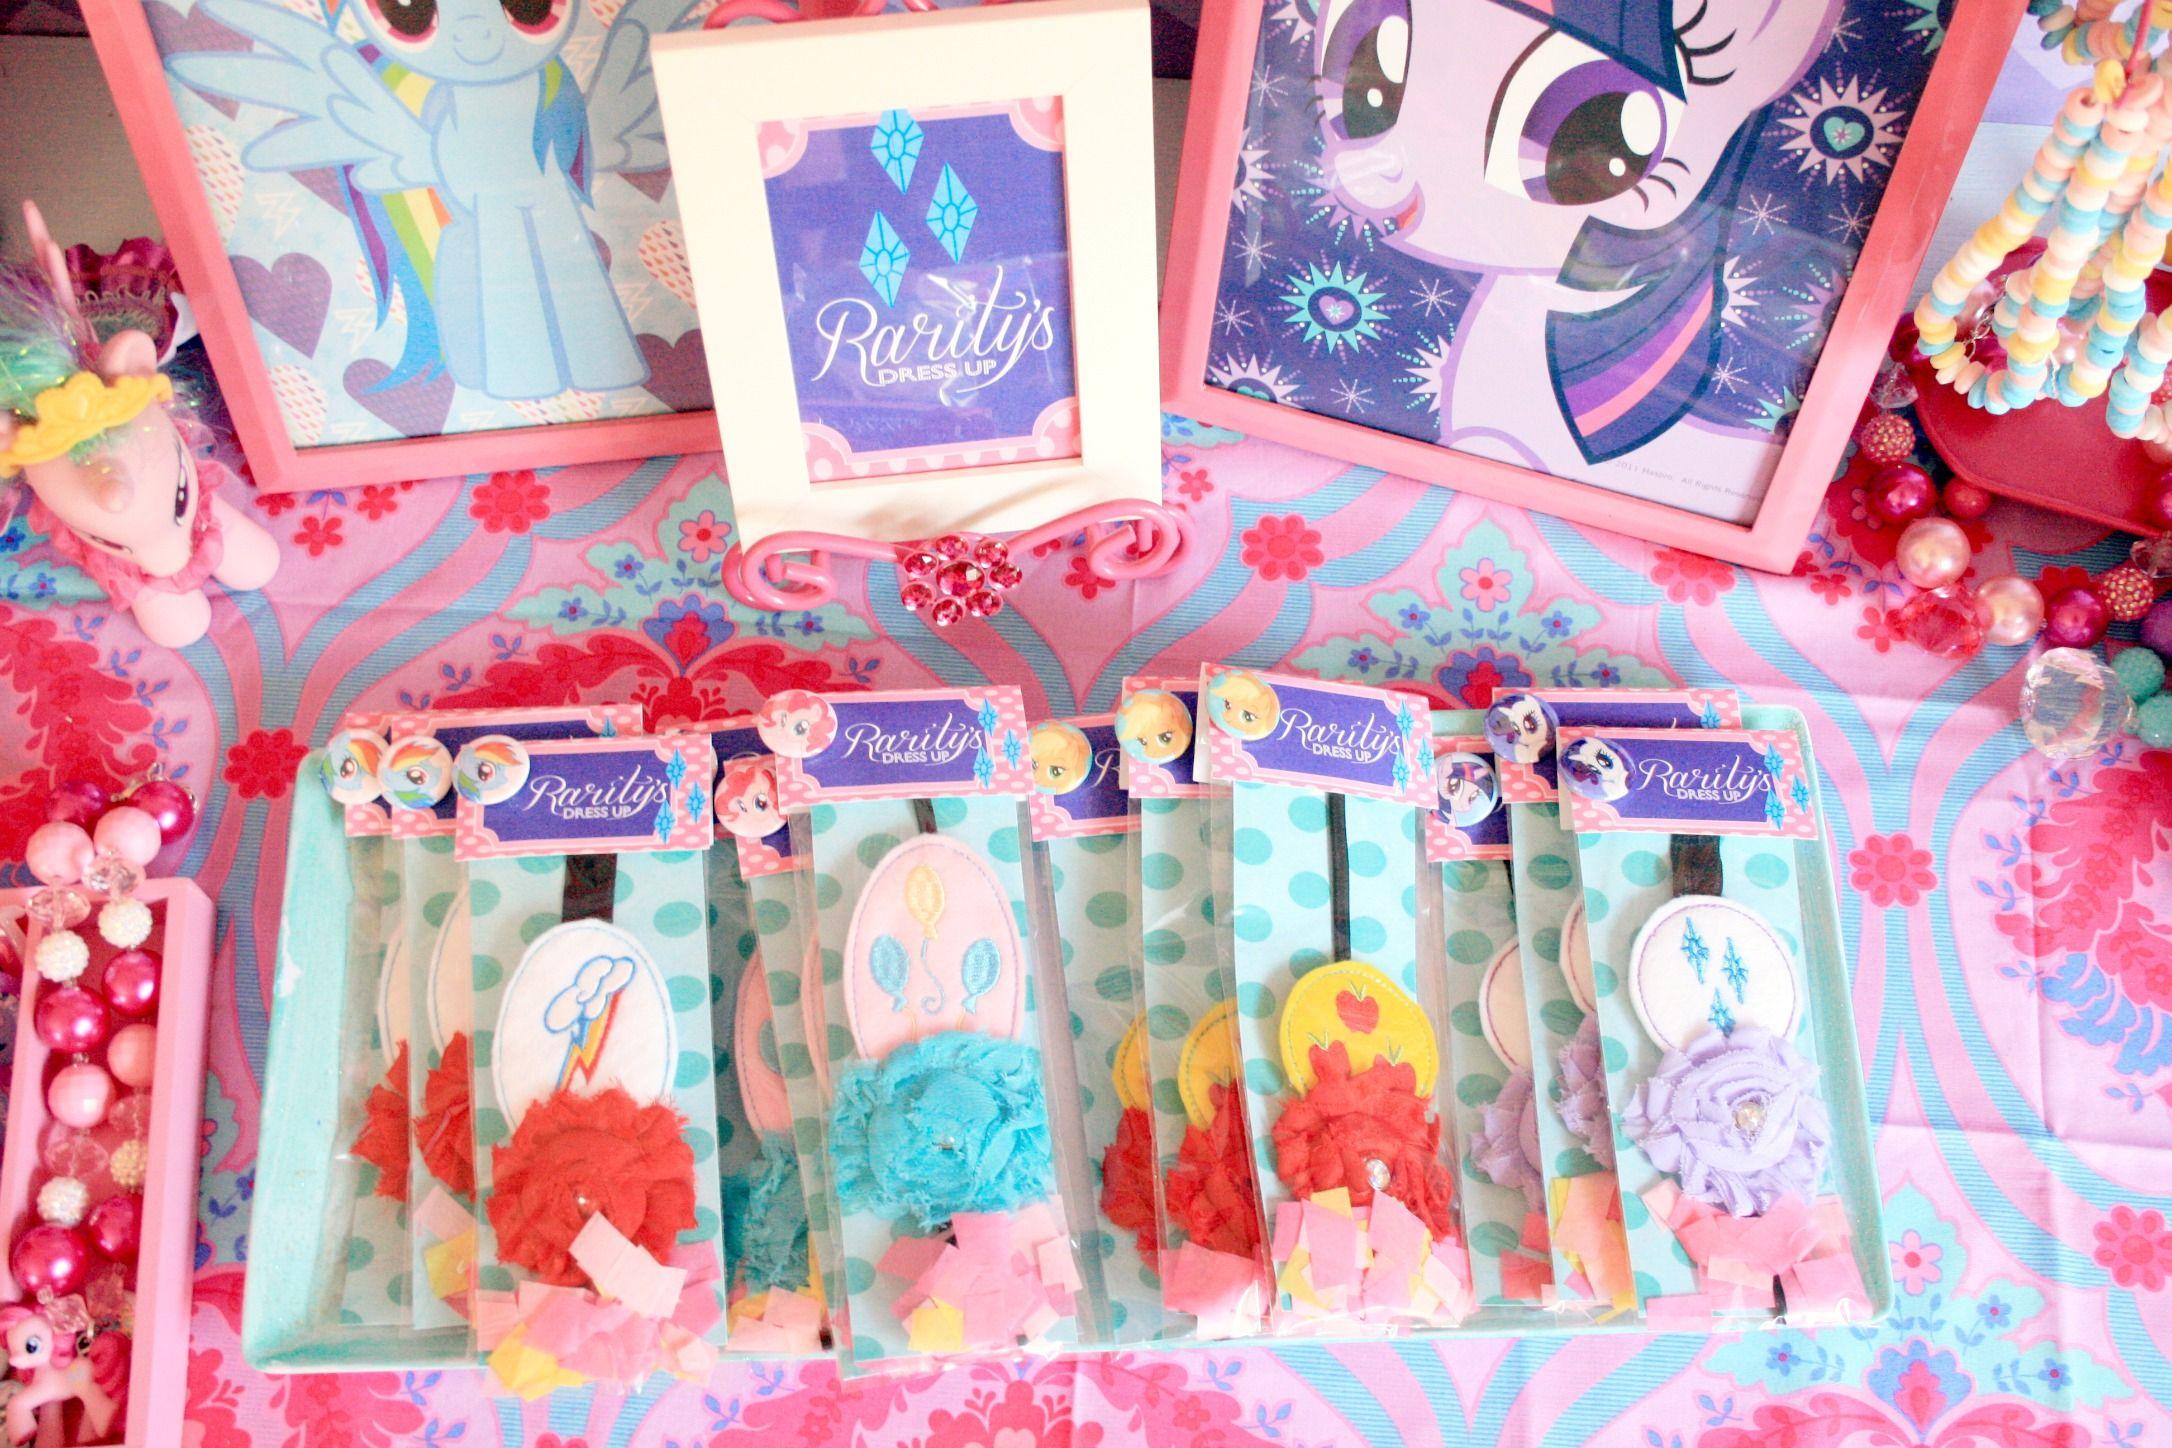 my little pony party LZ #5 | Party Ideas: Unicorn/Pony (My little ...